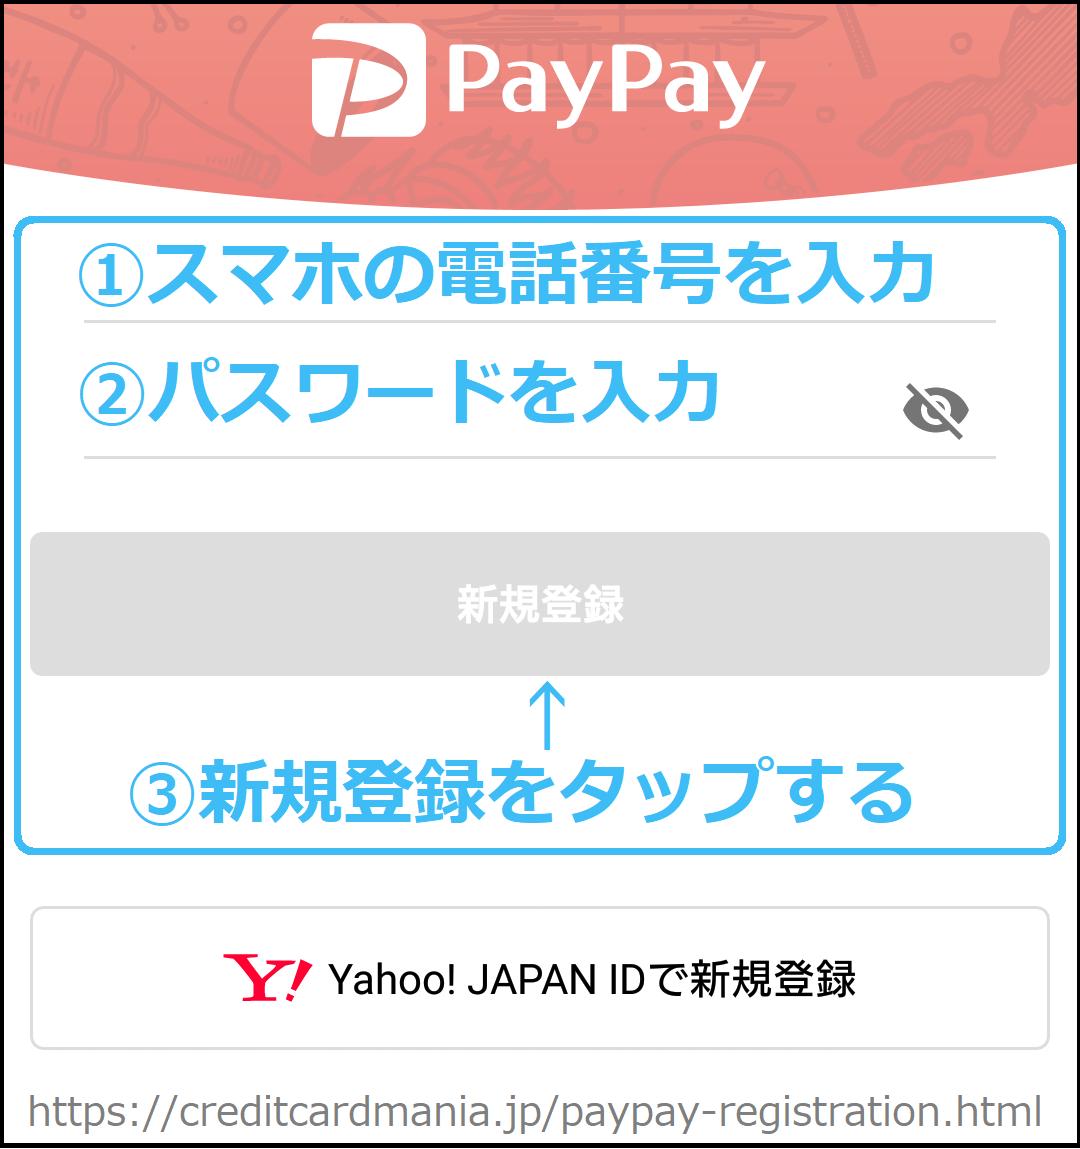 PayPayの新規登録(スマホの電話番号とパスワード編)